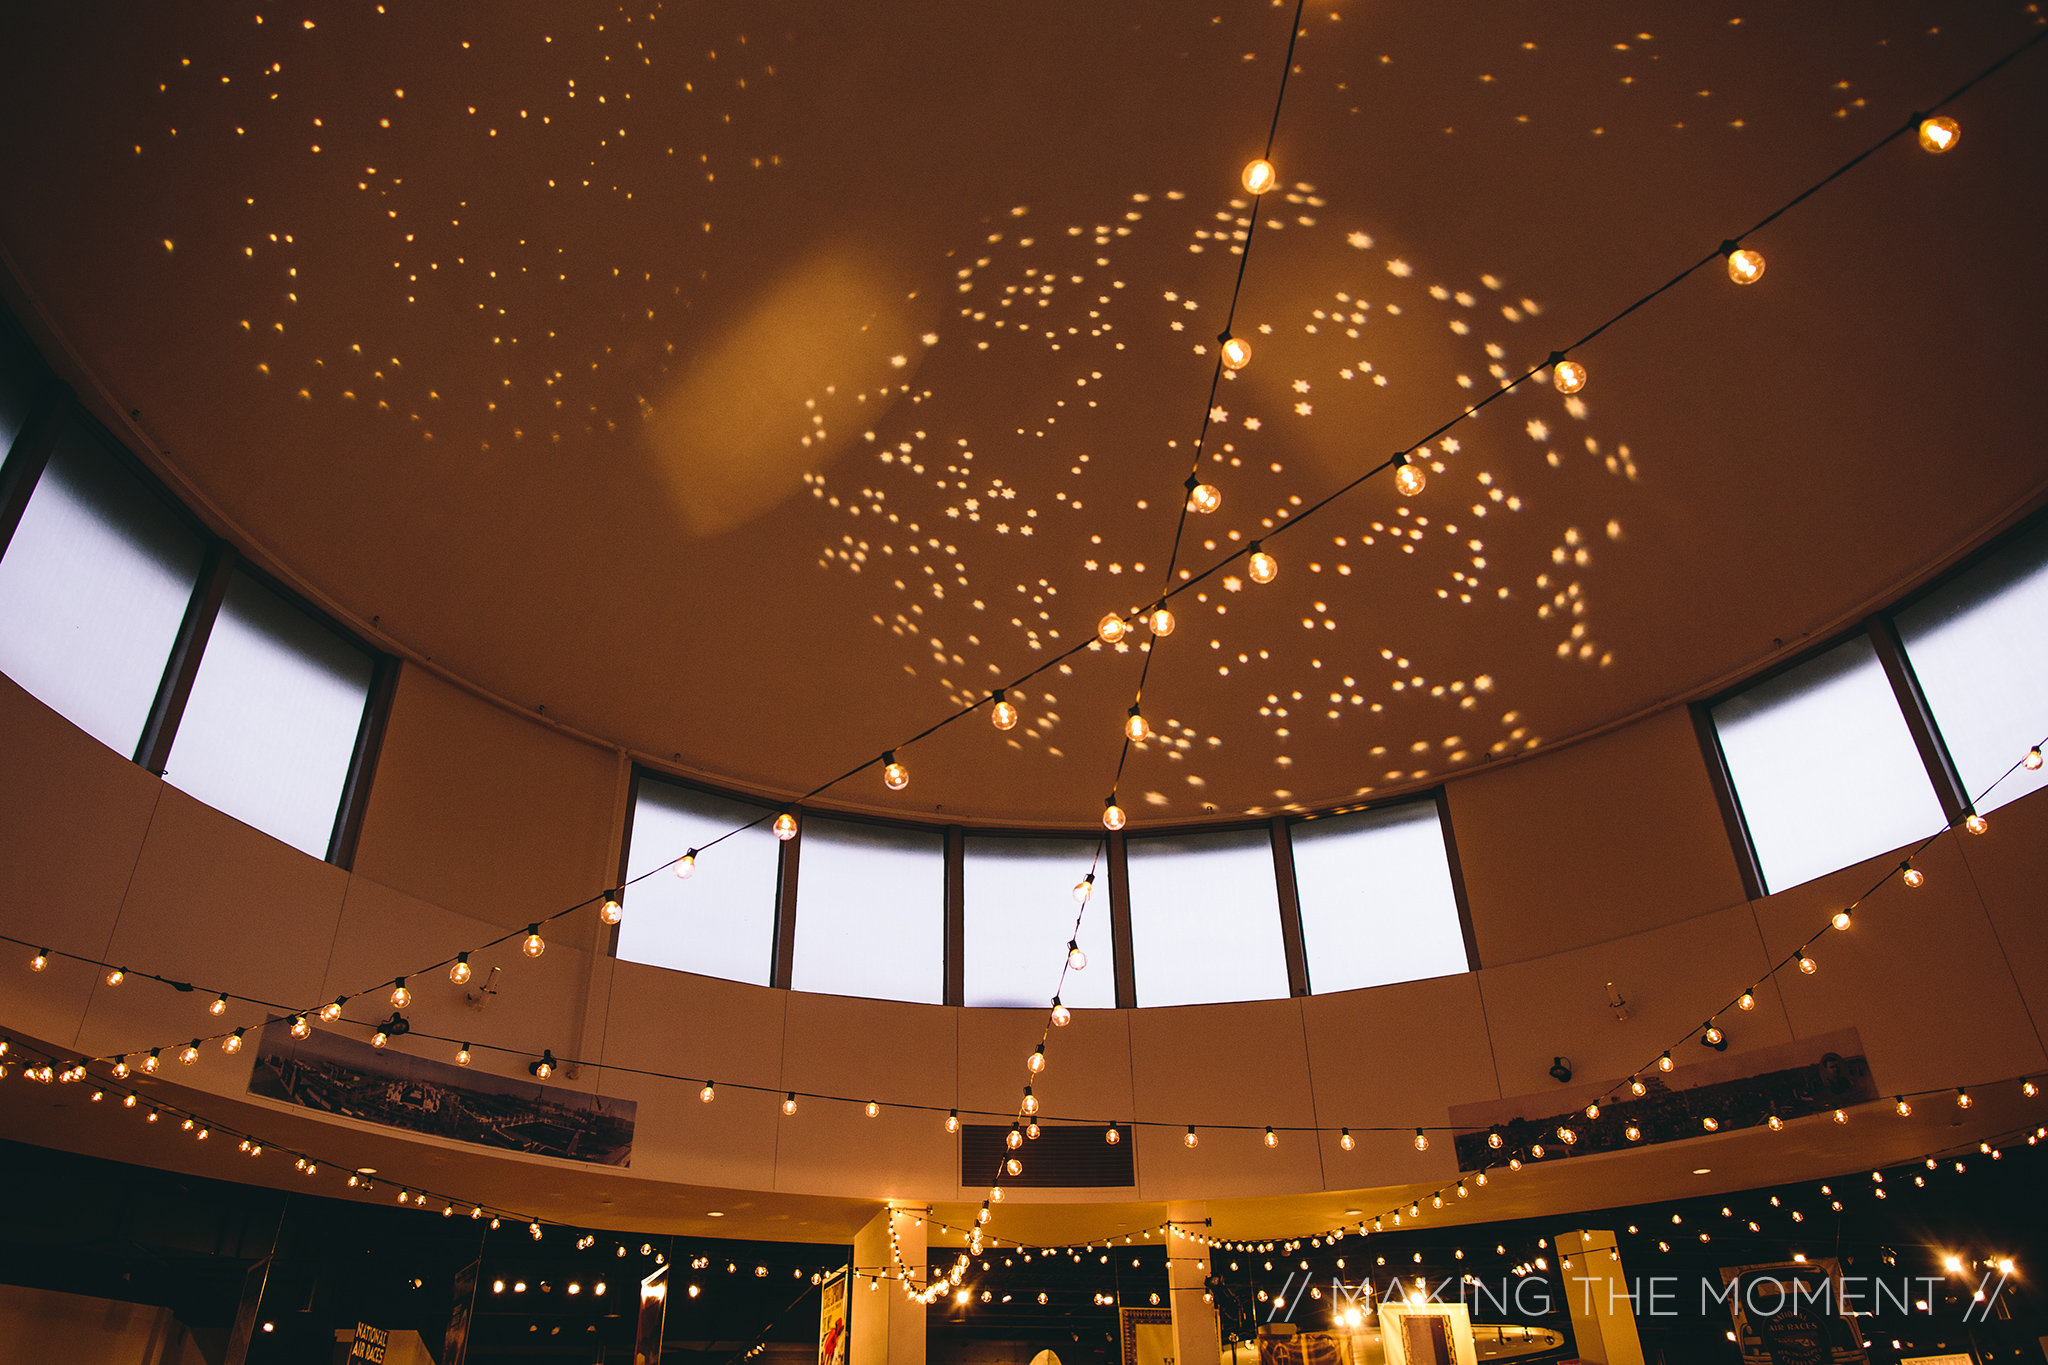 Western Reserve Historical Society wedding reception in the Crawford Rotunda